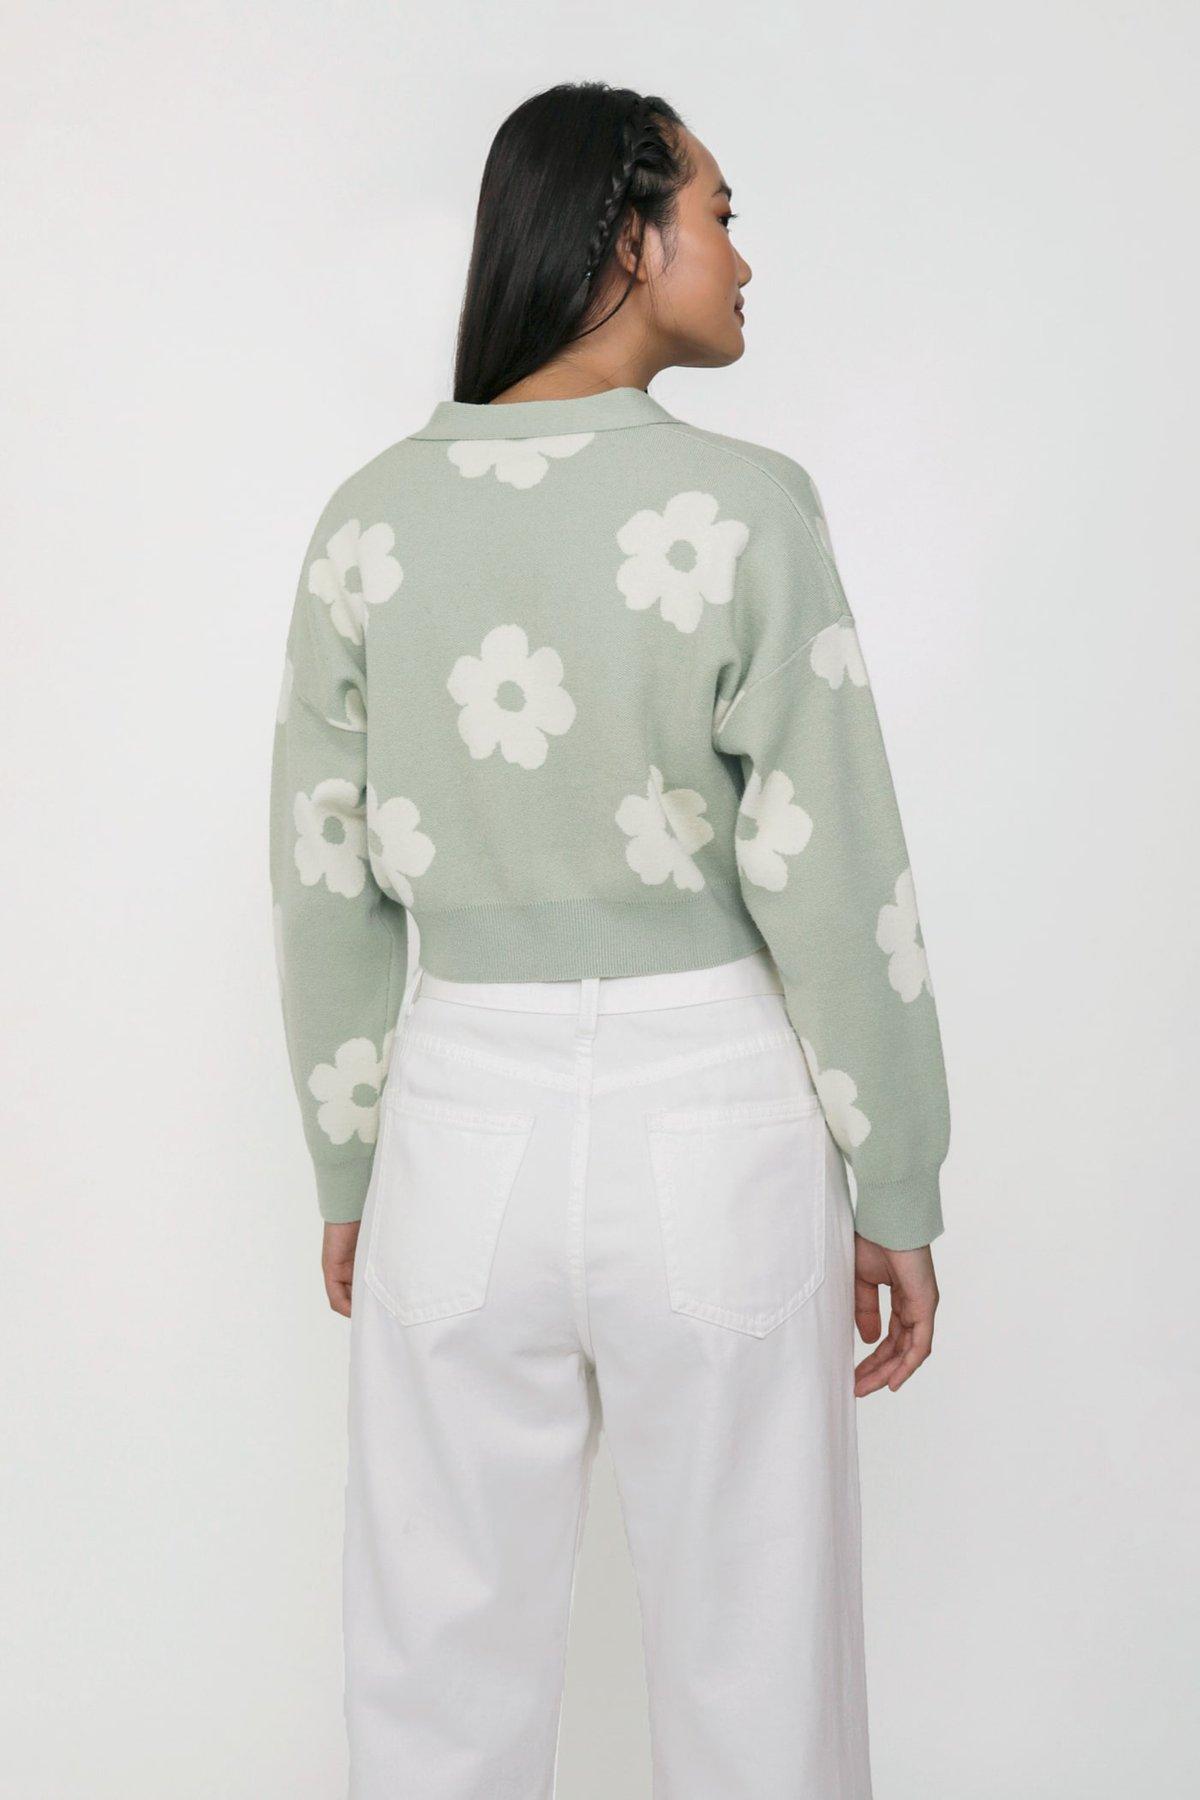 #1- Euphoria Knit Cardigan (Sage Florals) Limited Edition